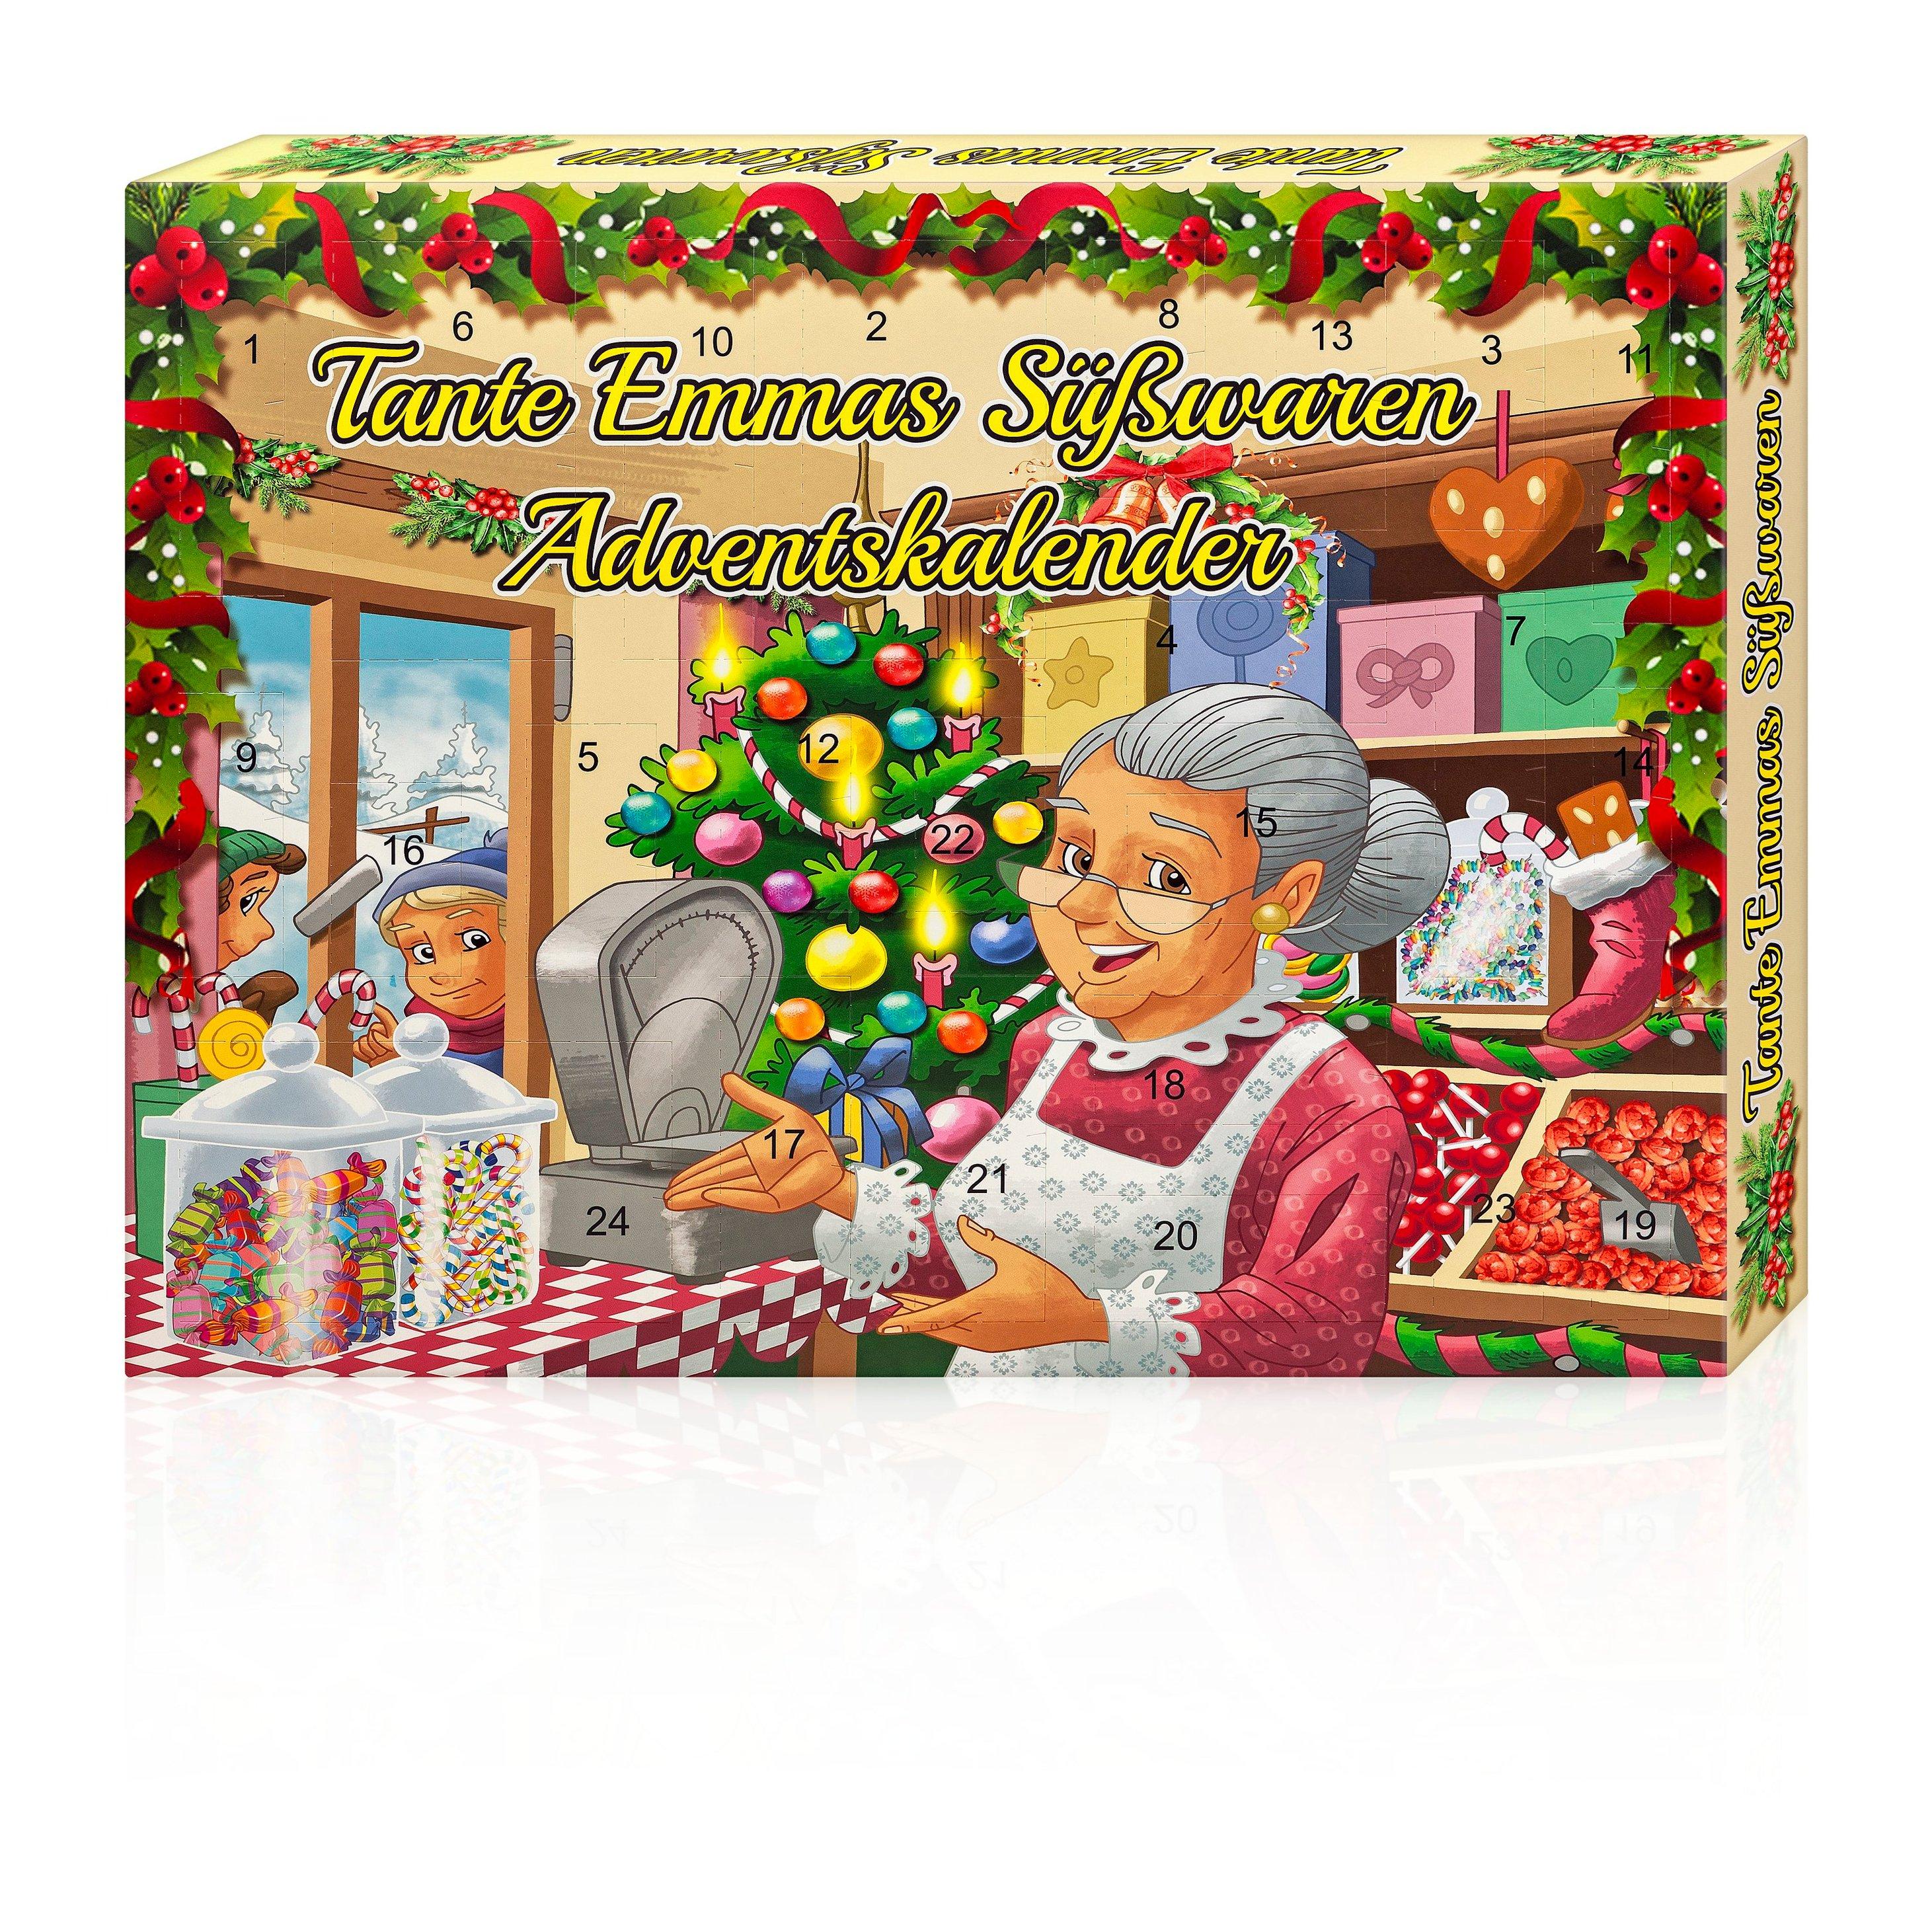 Tante Emmas Süßwaren Adventskalender